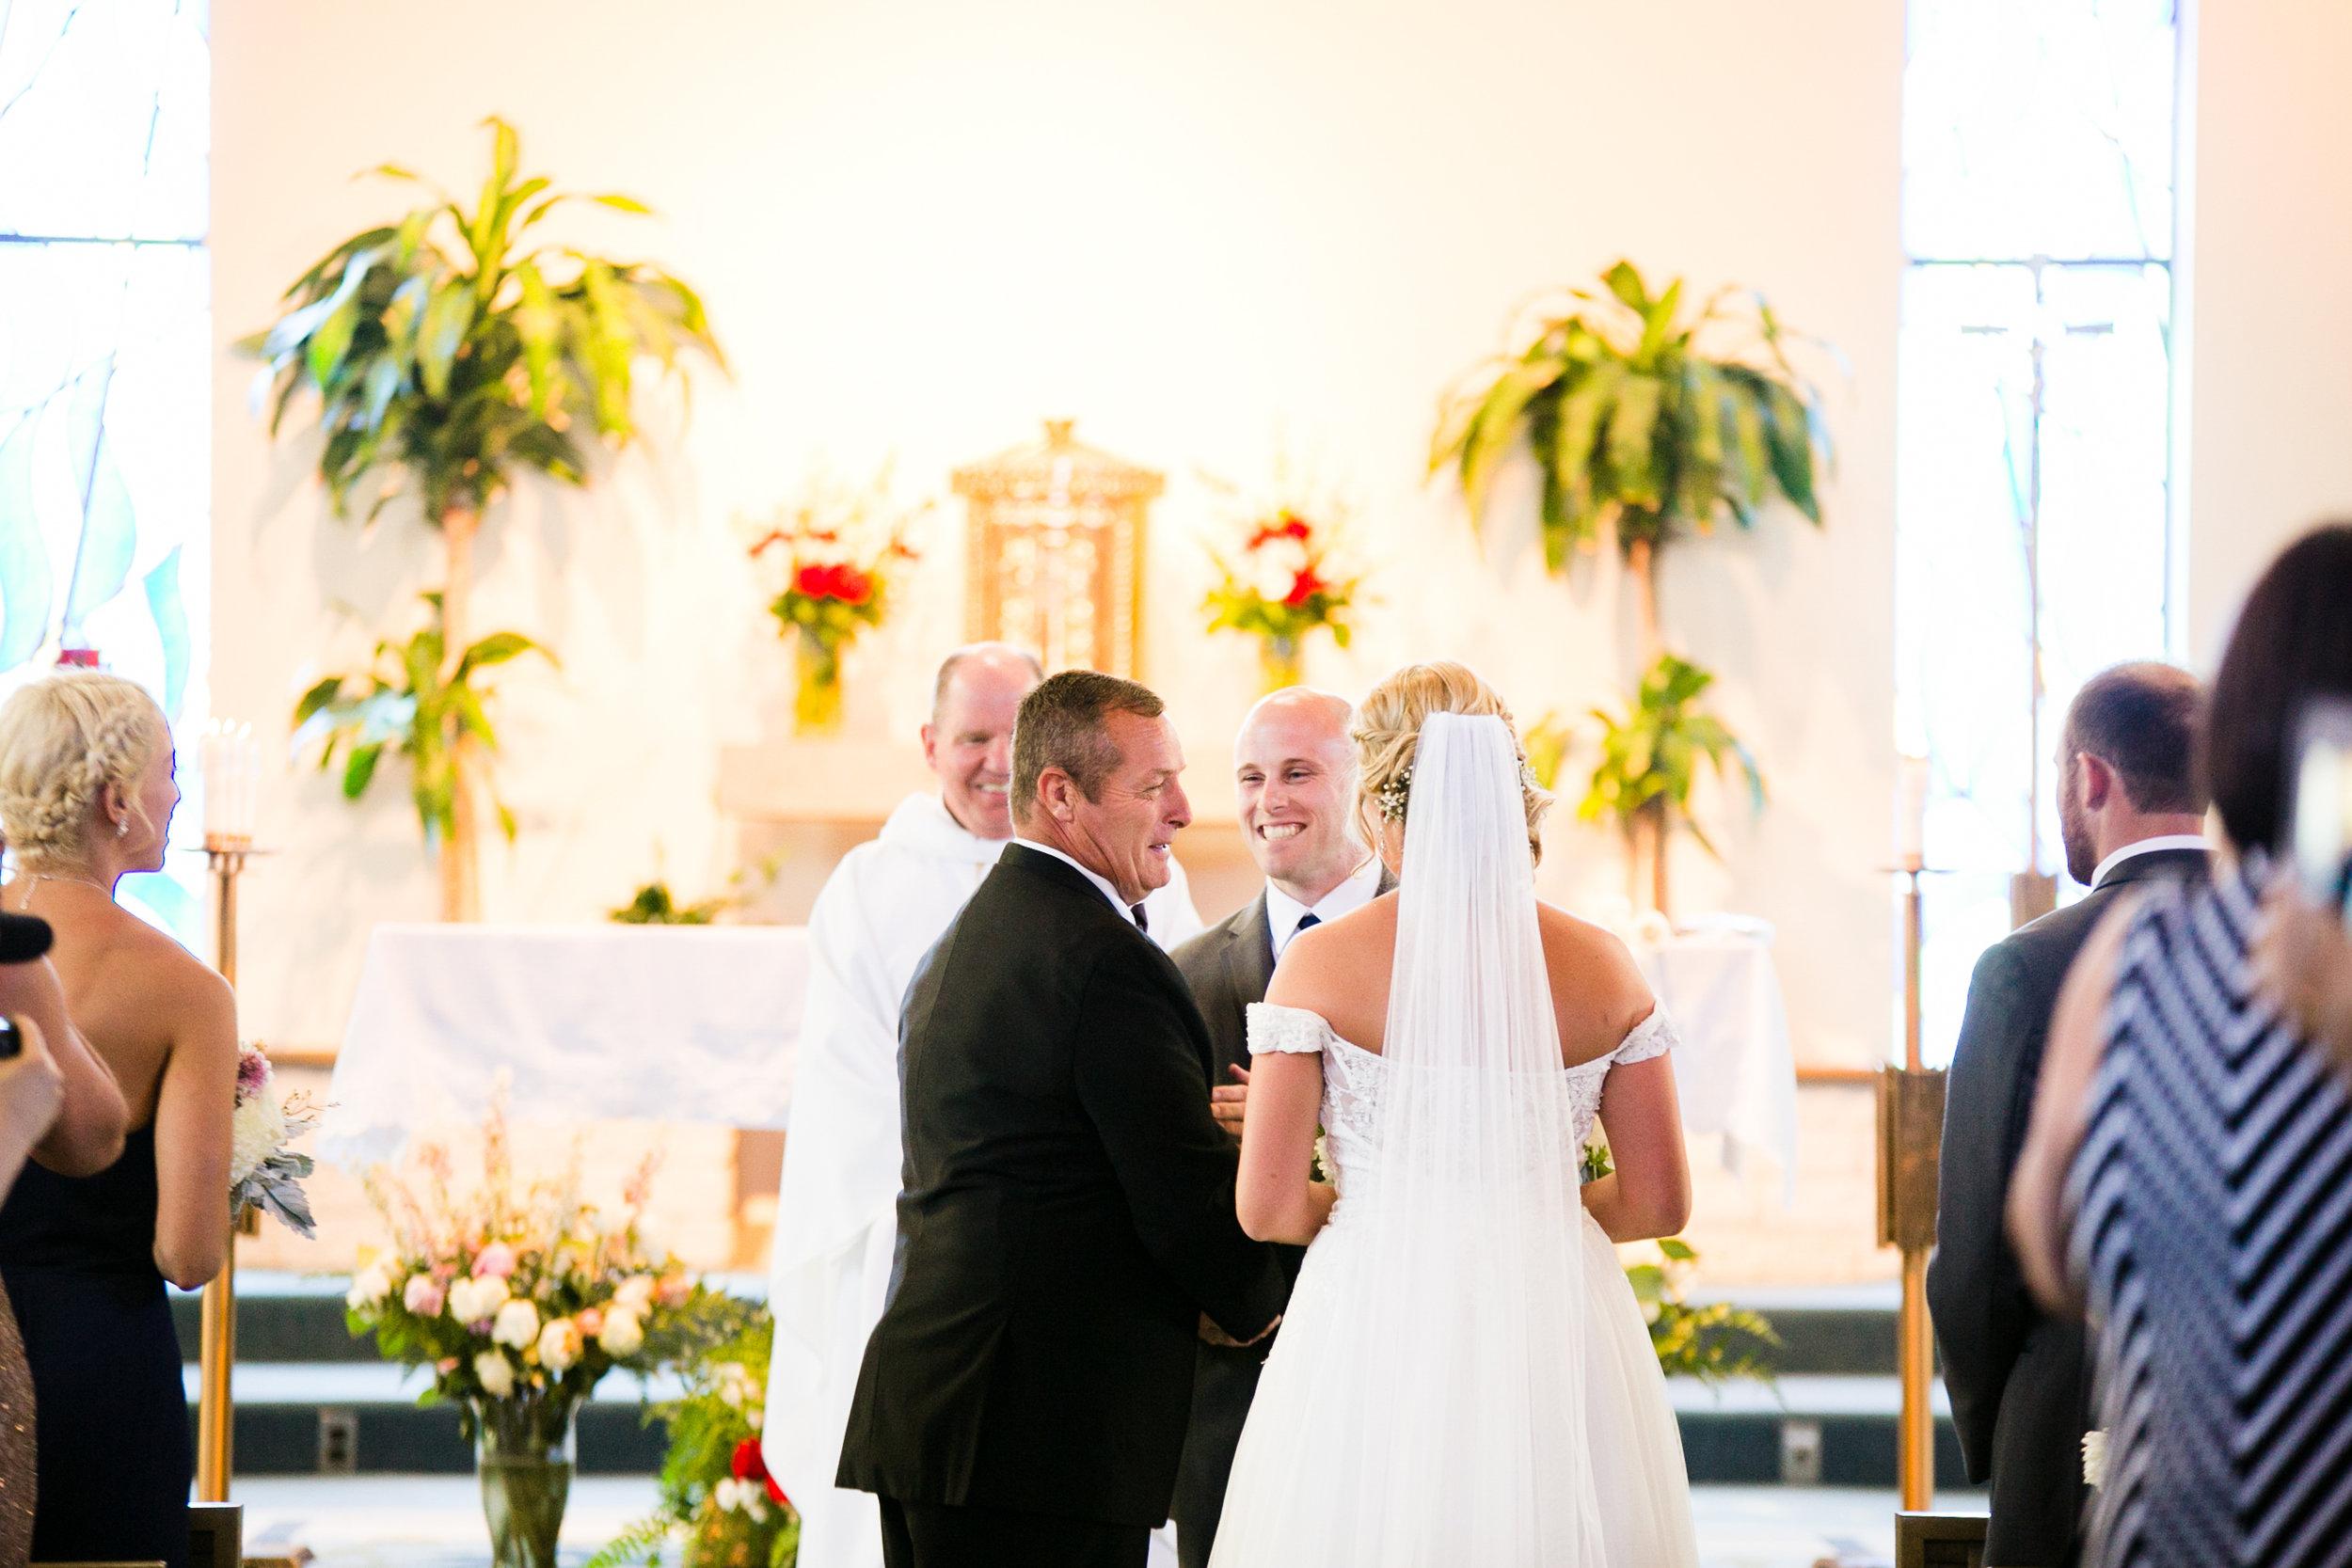 ICONA GOLDEN INN AVALON NJ WEDDING PHOTOGRAPHY  - 042.jpg